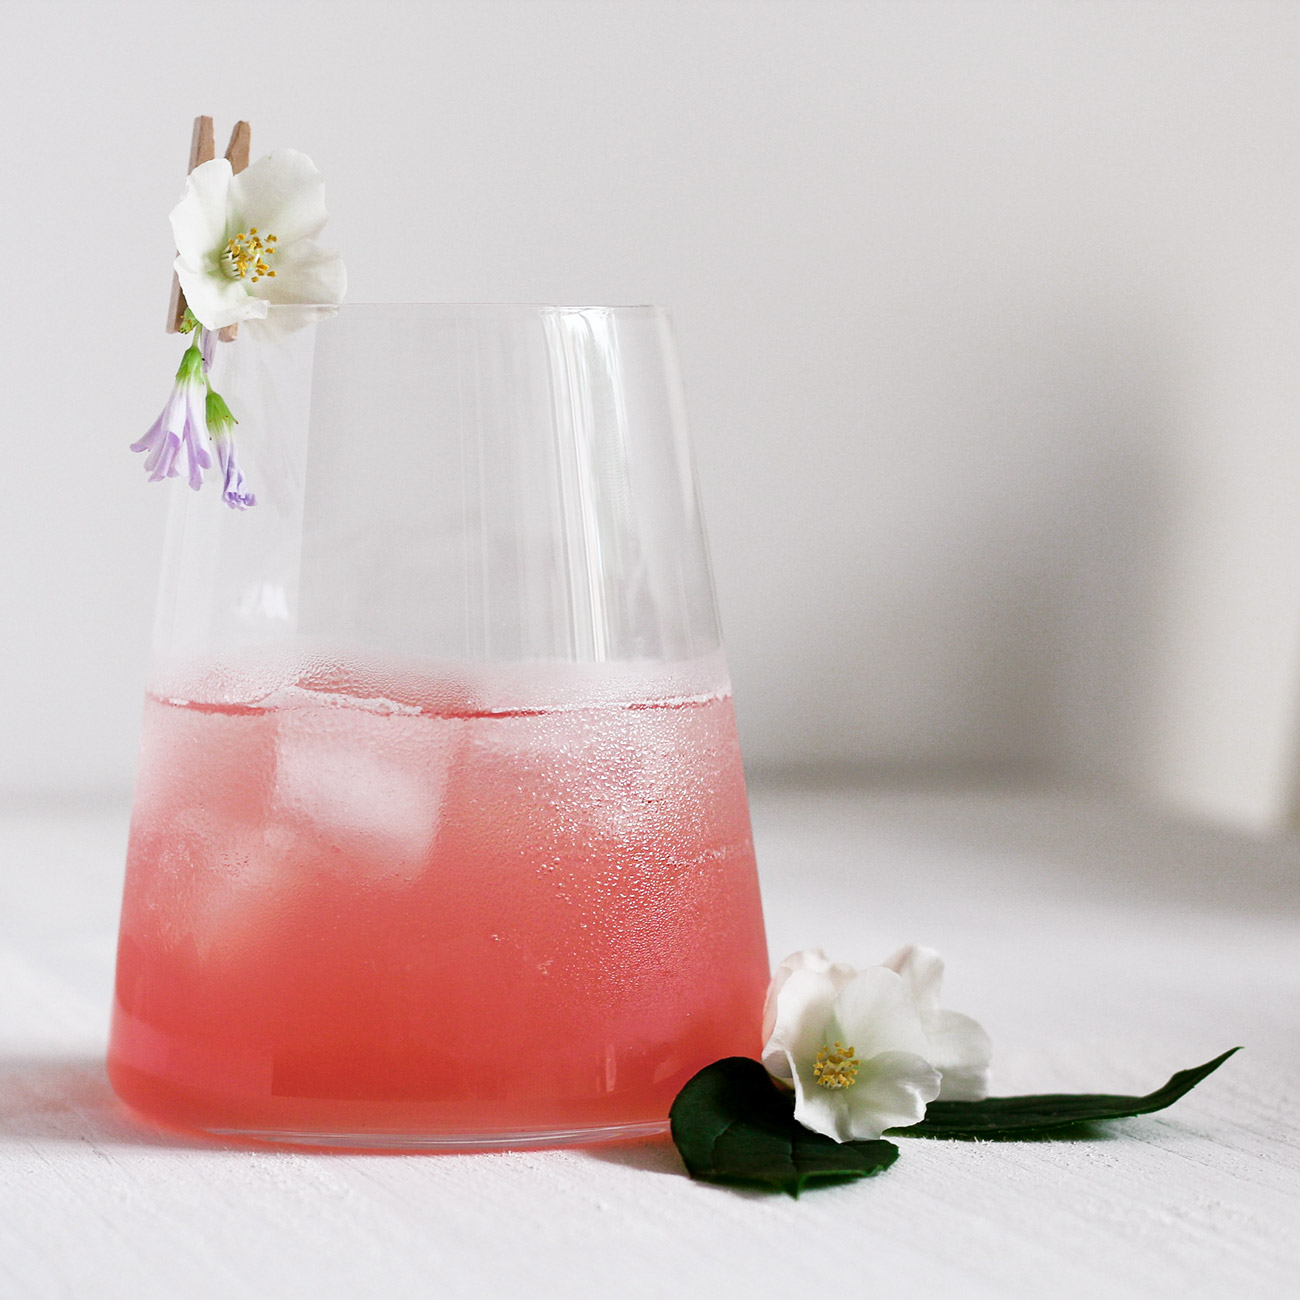 Double Rhubarb Gin Fizz